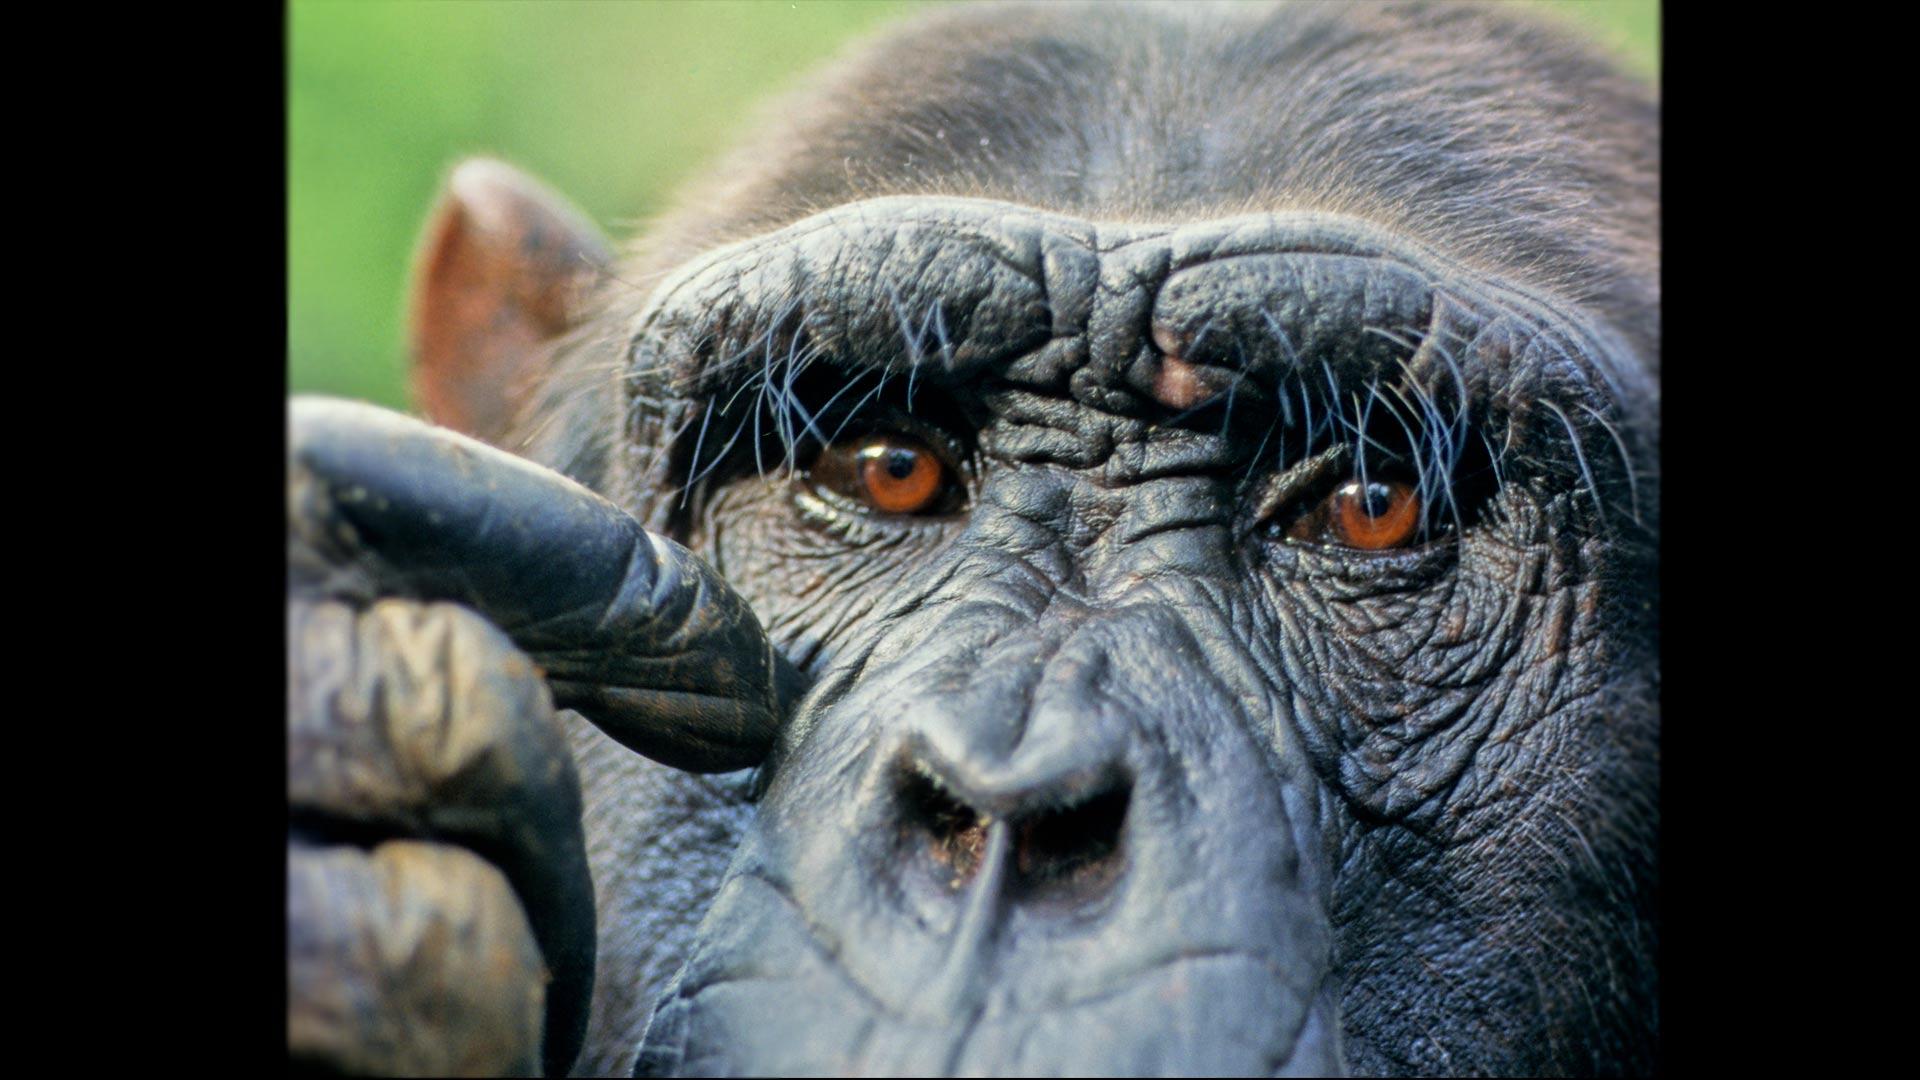 Portrait of Male Chimpanzee.